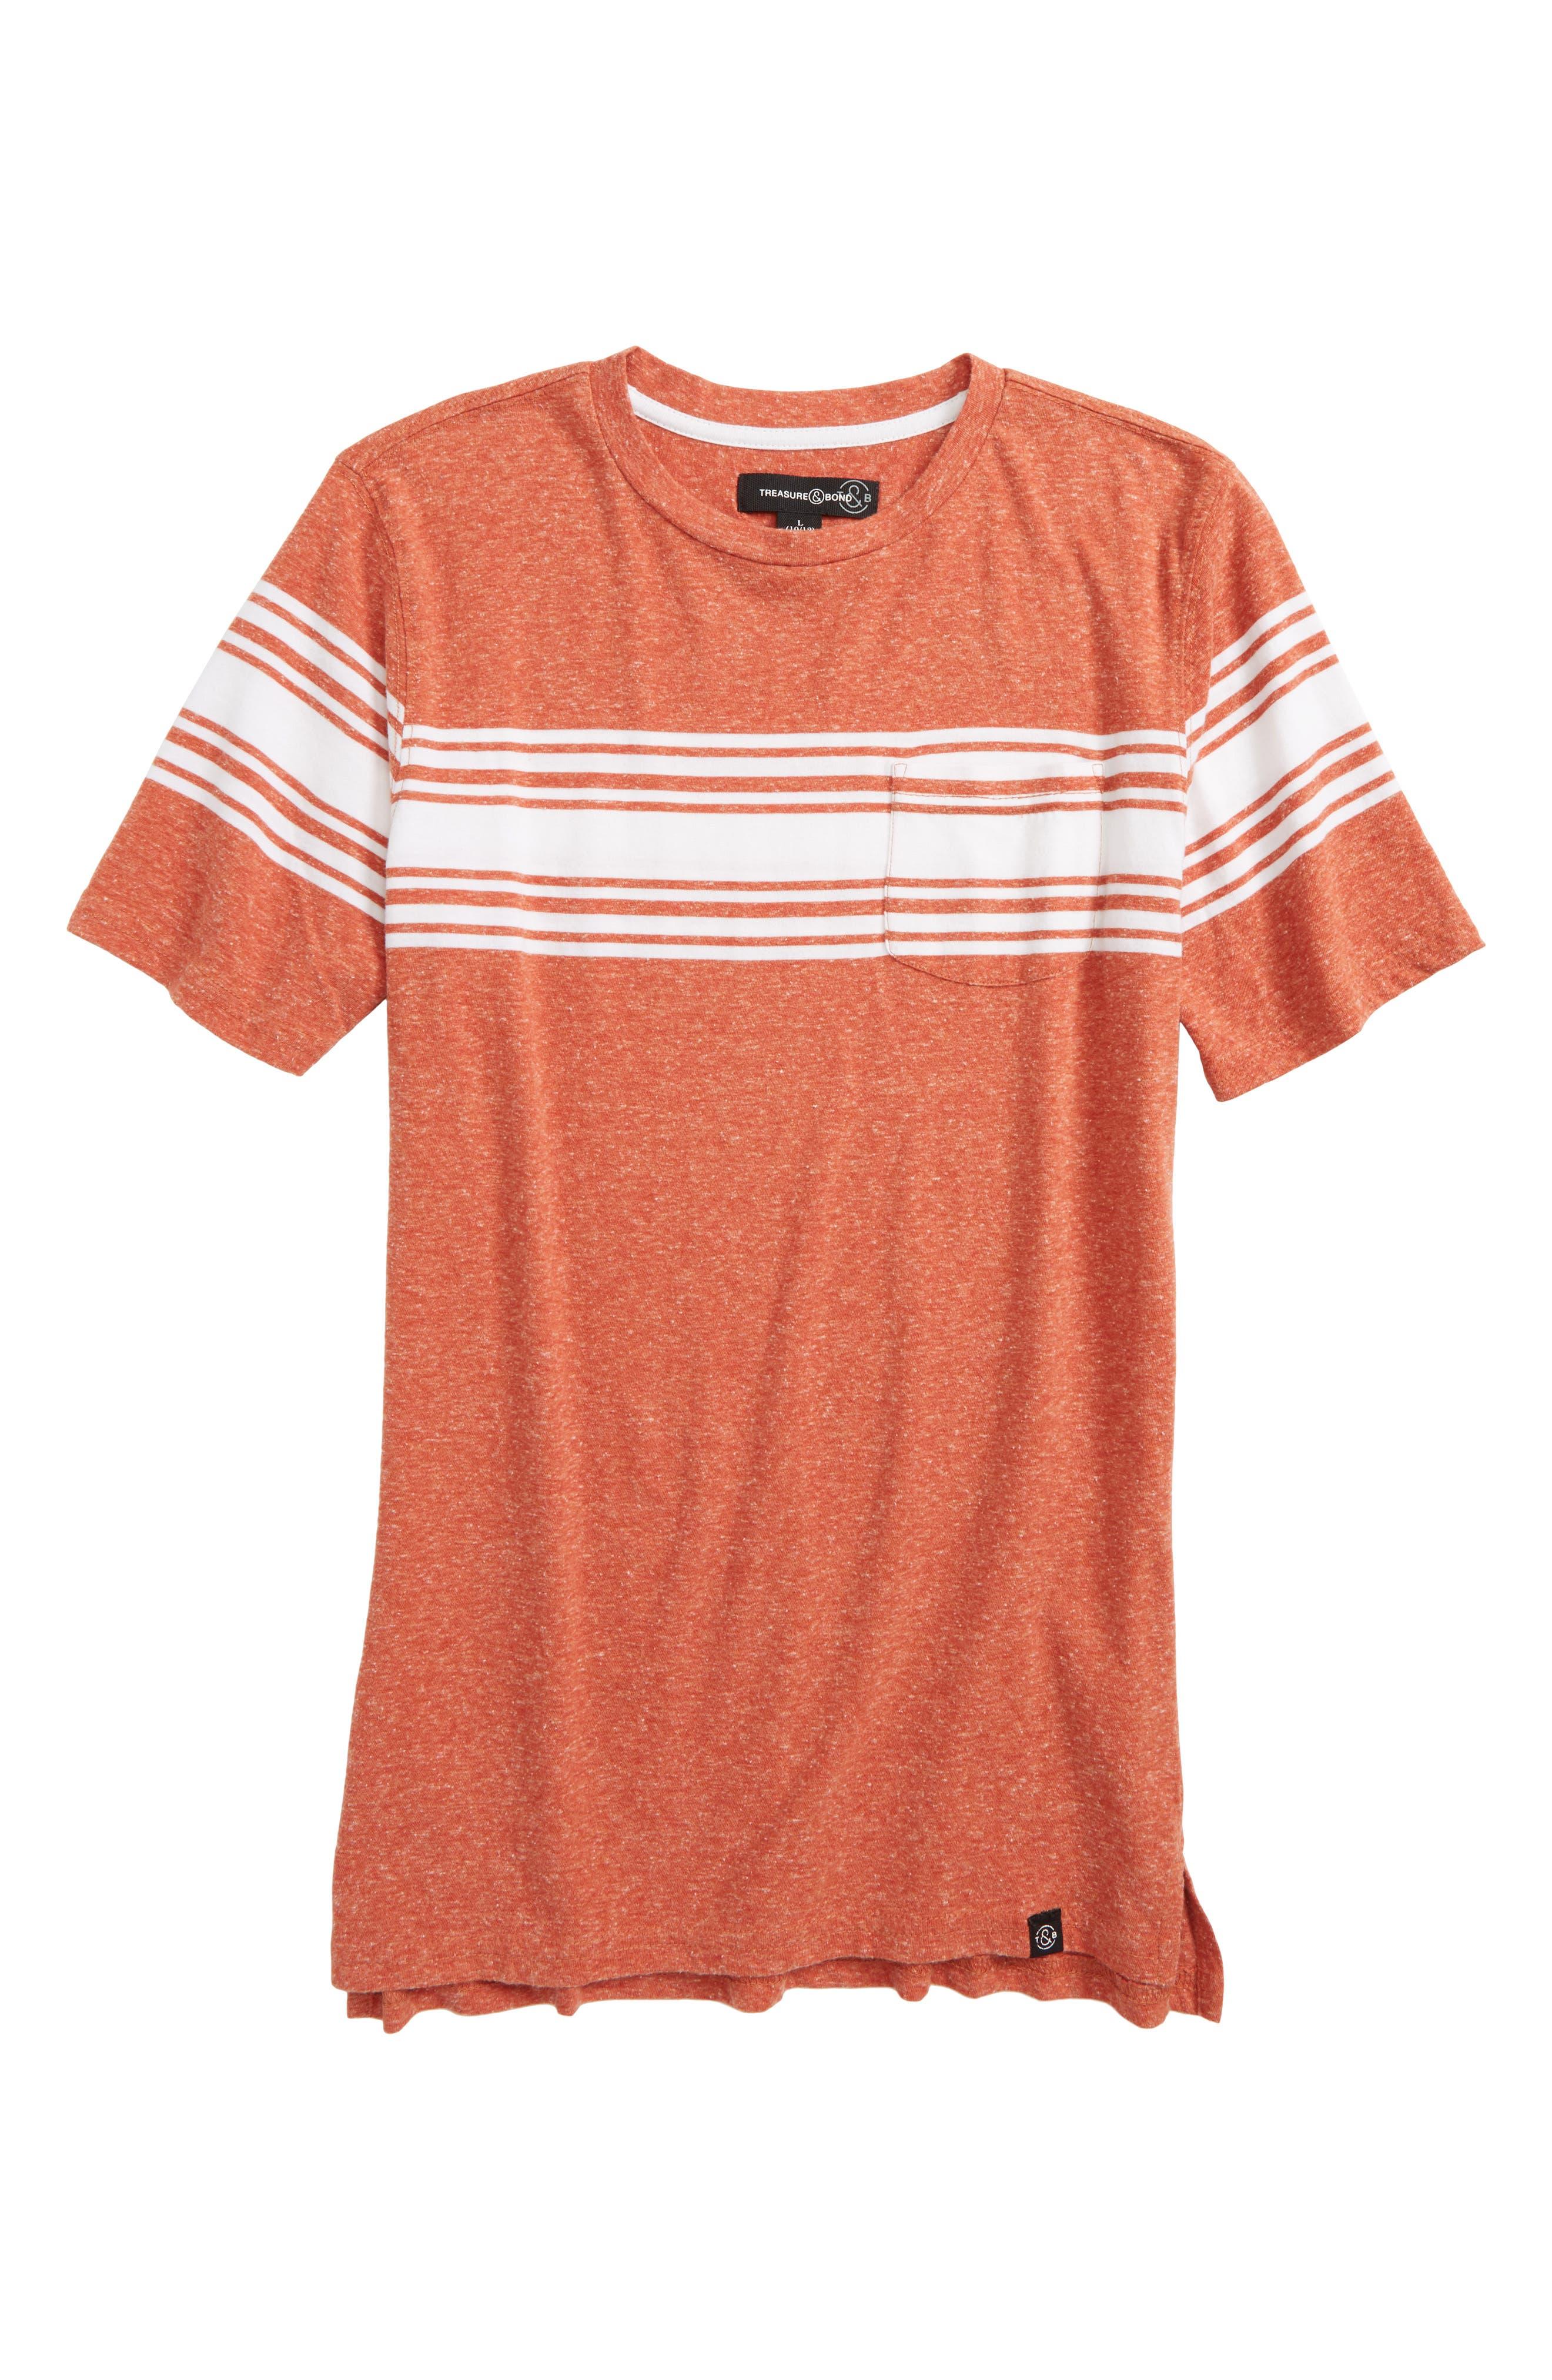 Stripe T-Shirt,                         Main,                         color, Rust Marsala Heather- White